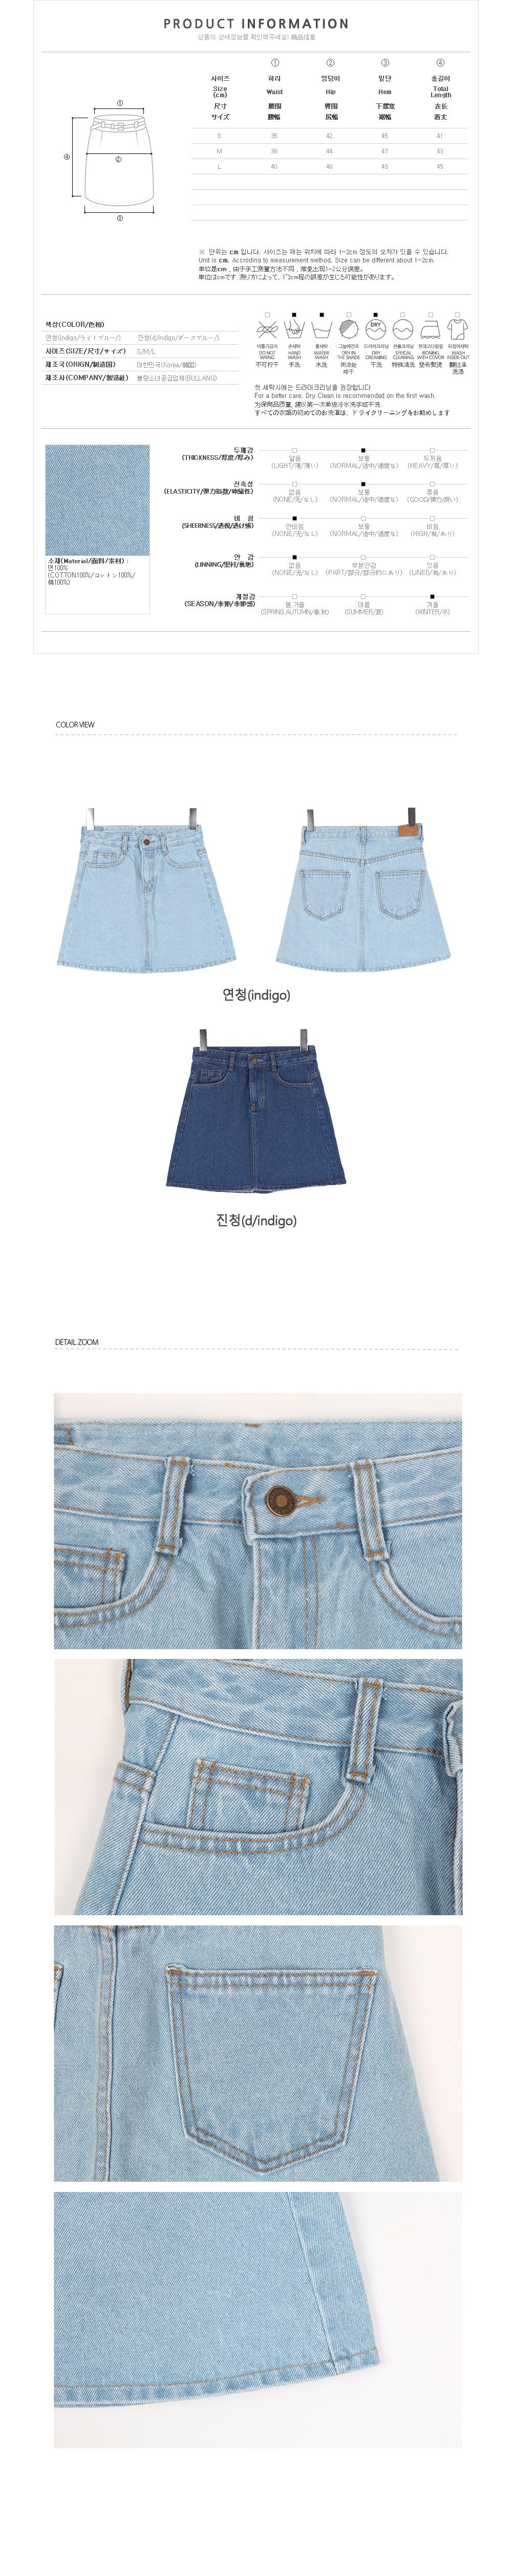 Mini-denim skirt